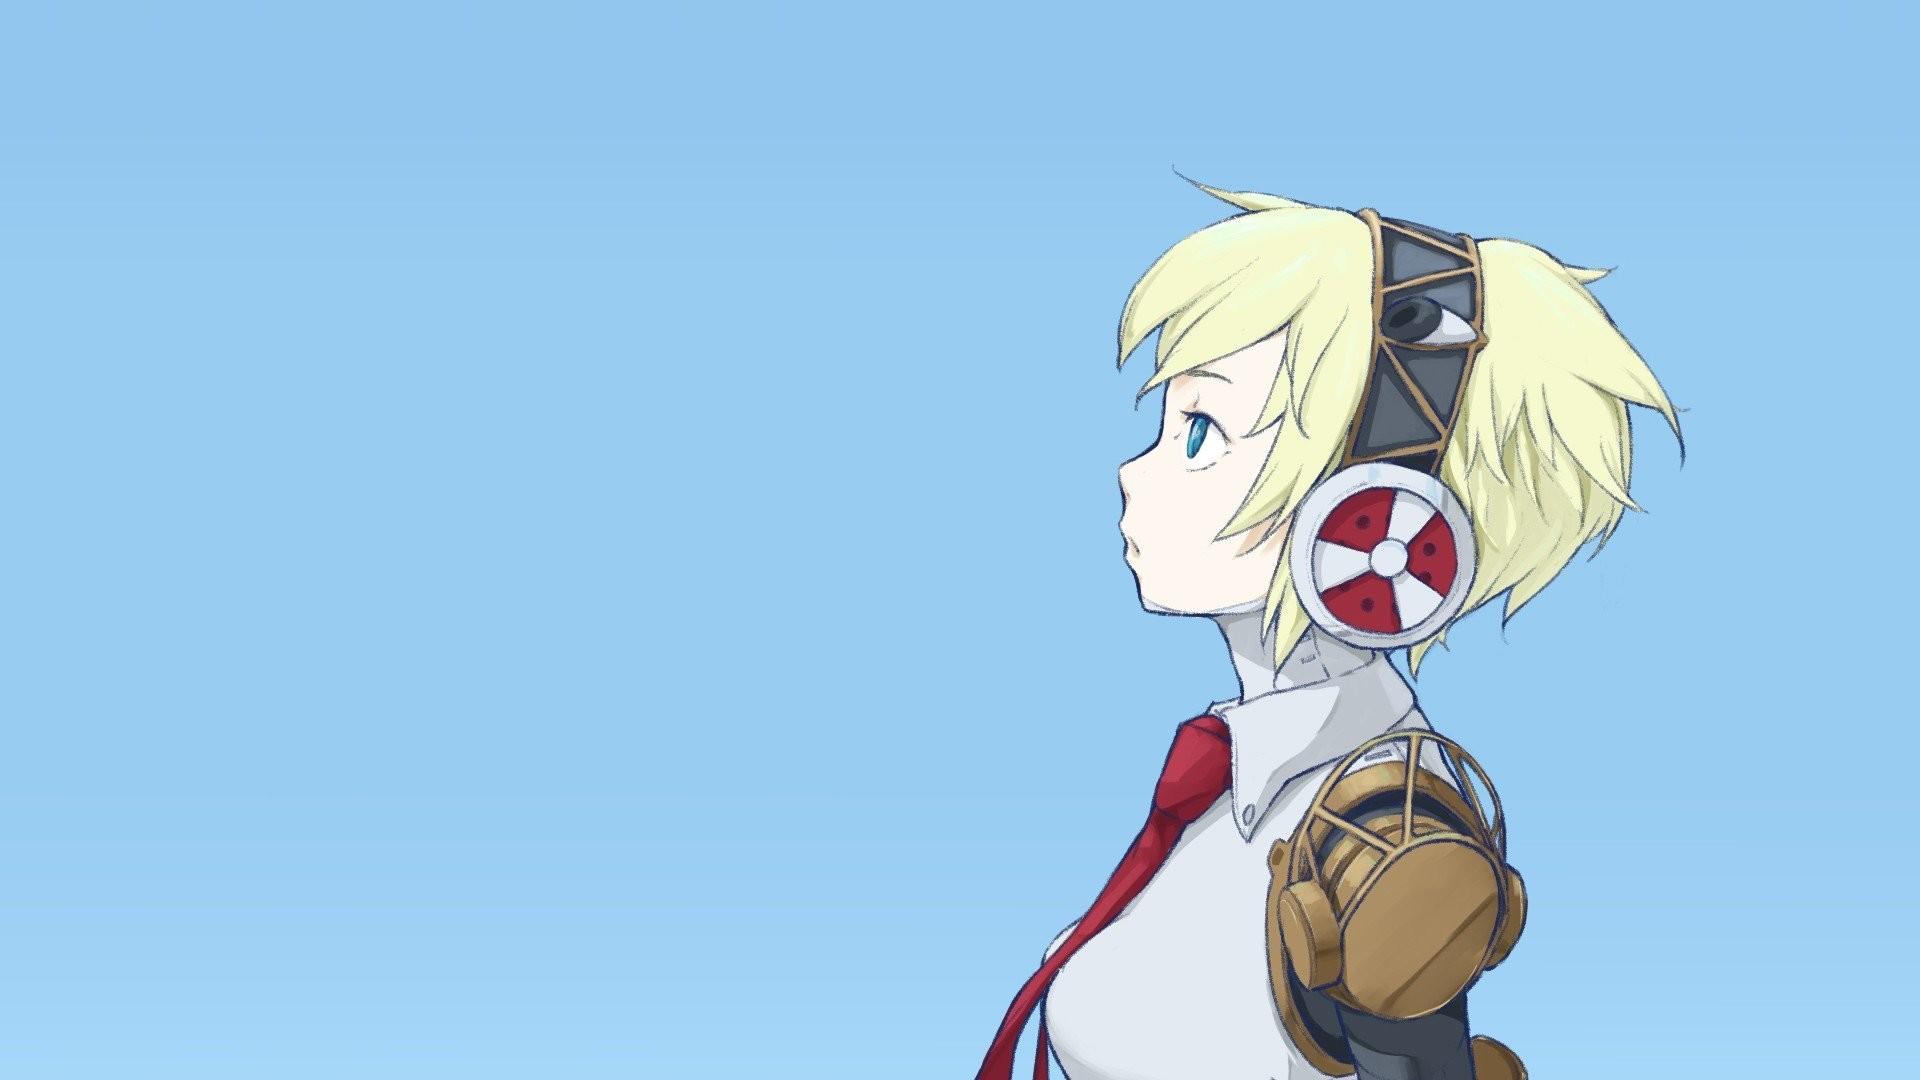 Android Persona series Persona 3 Persona 4: Arena Aigis Persona 3: FES  wallpaper     243497   WallpaperUP